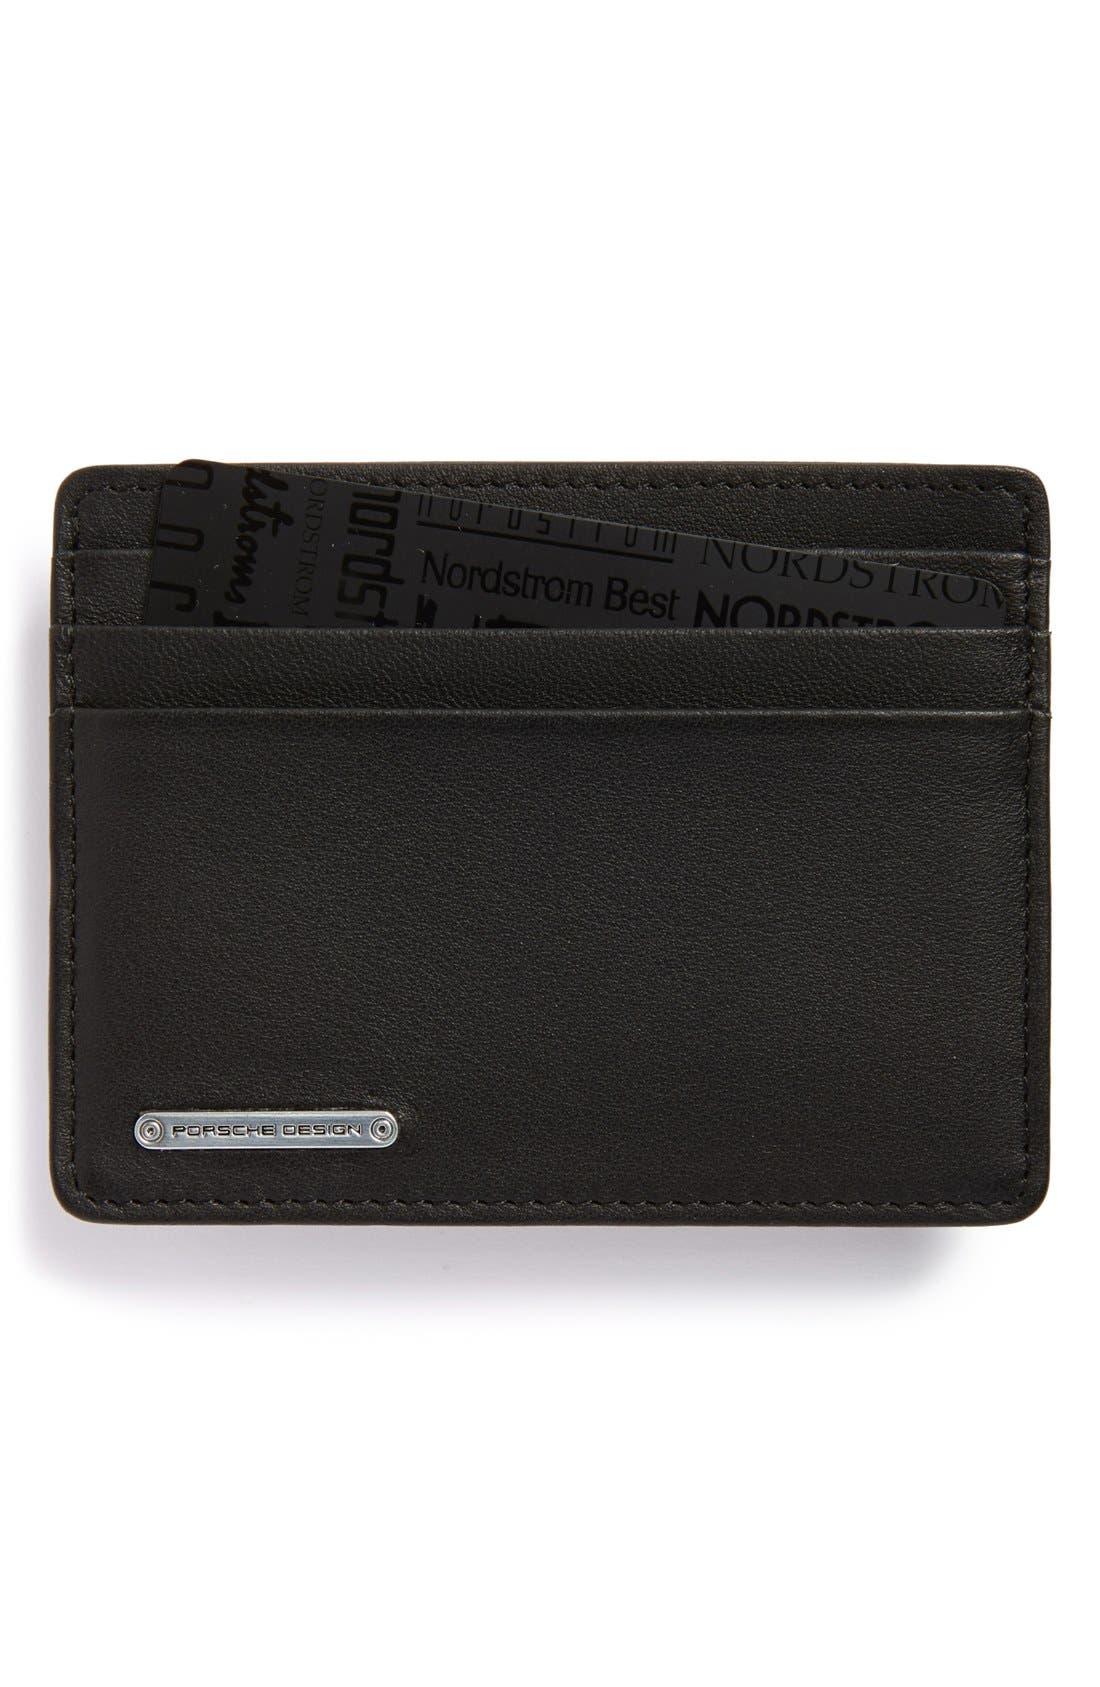 Main Image - Porsche Design Leather Cardholder